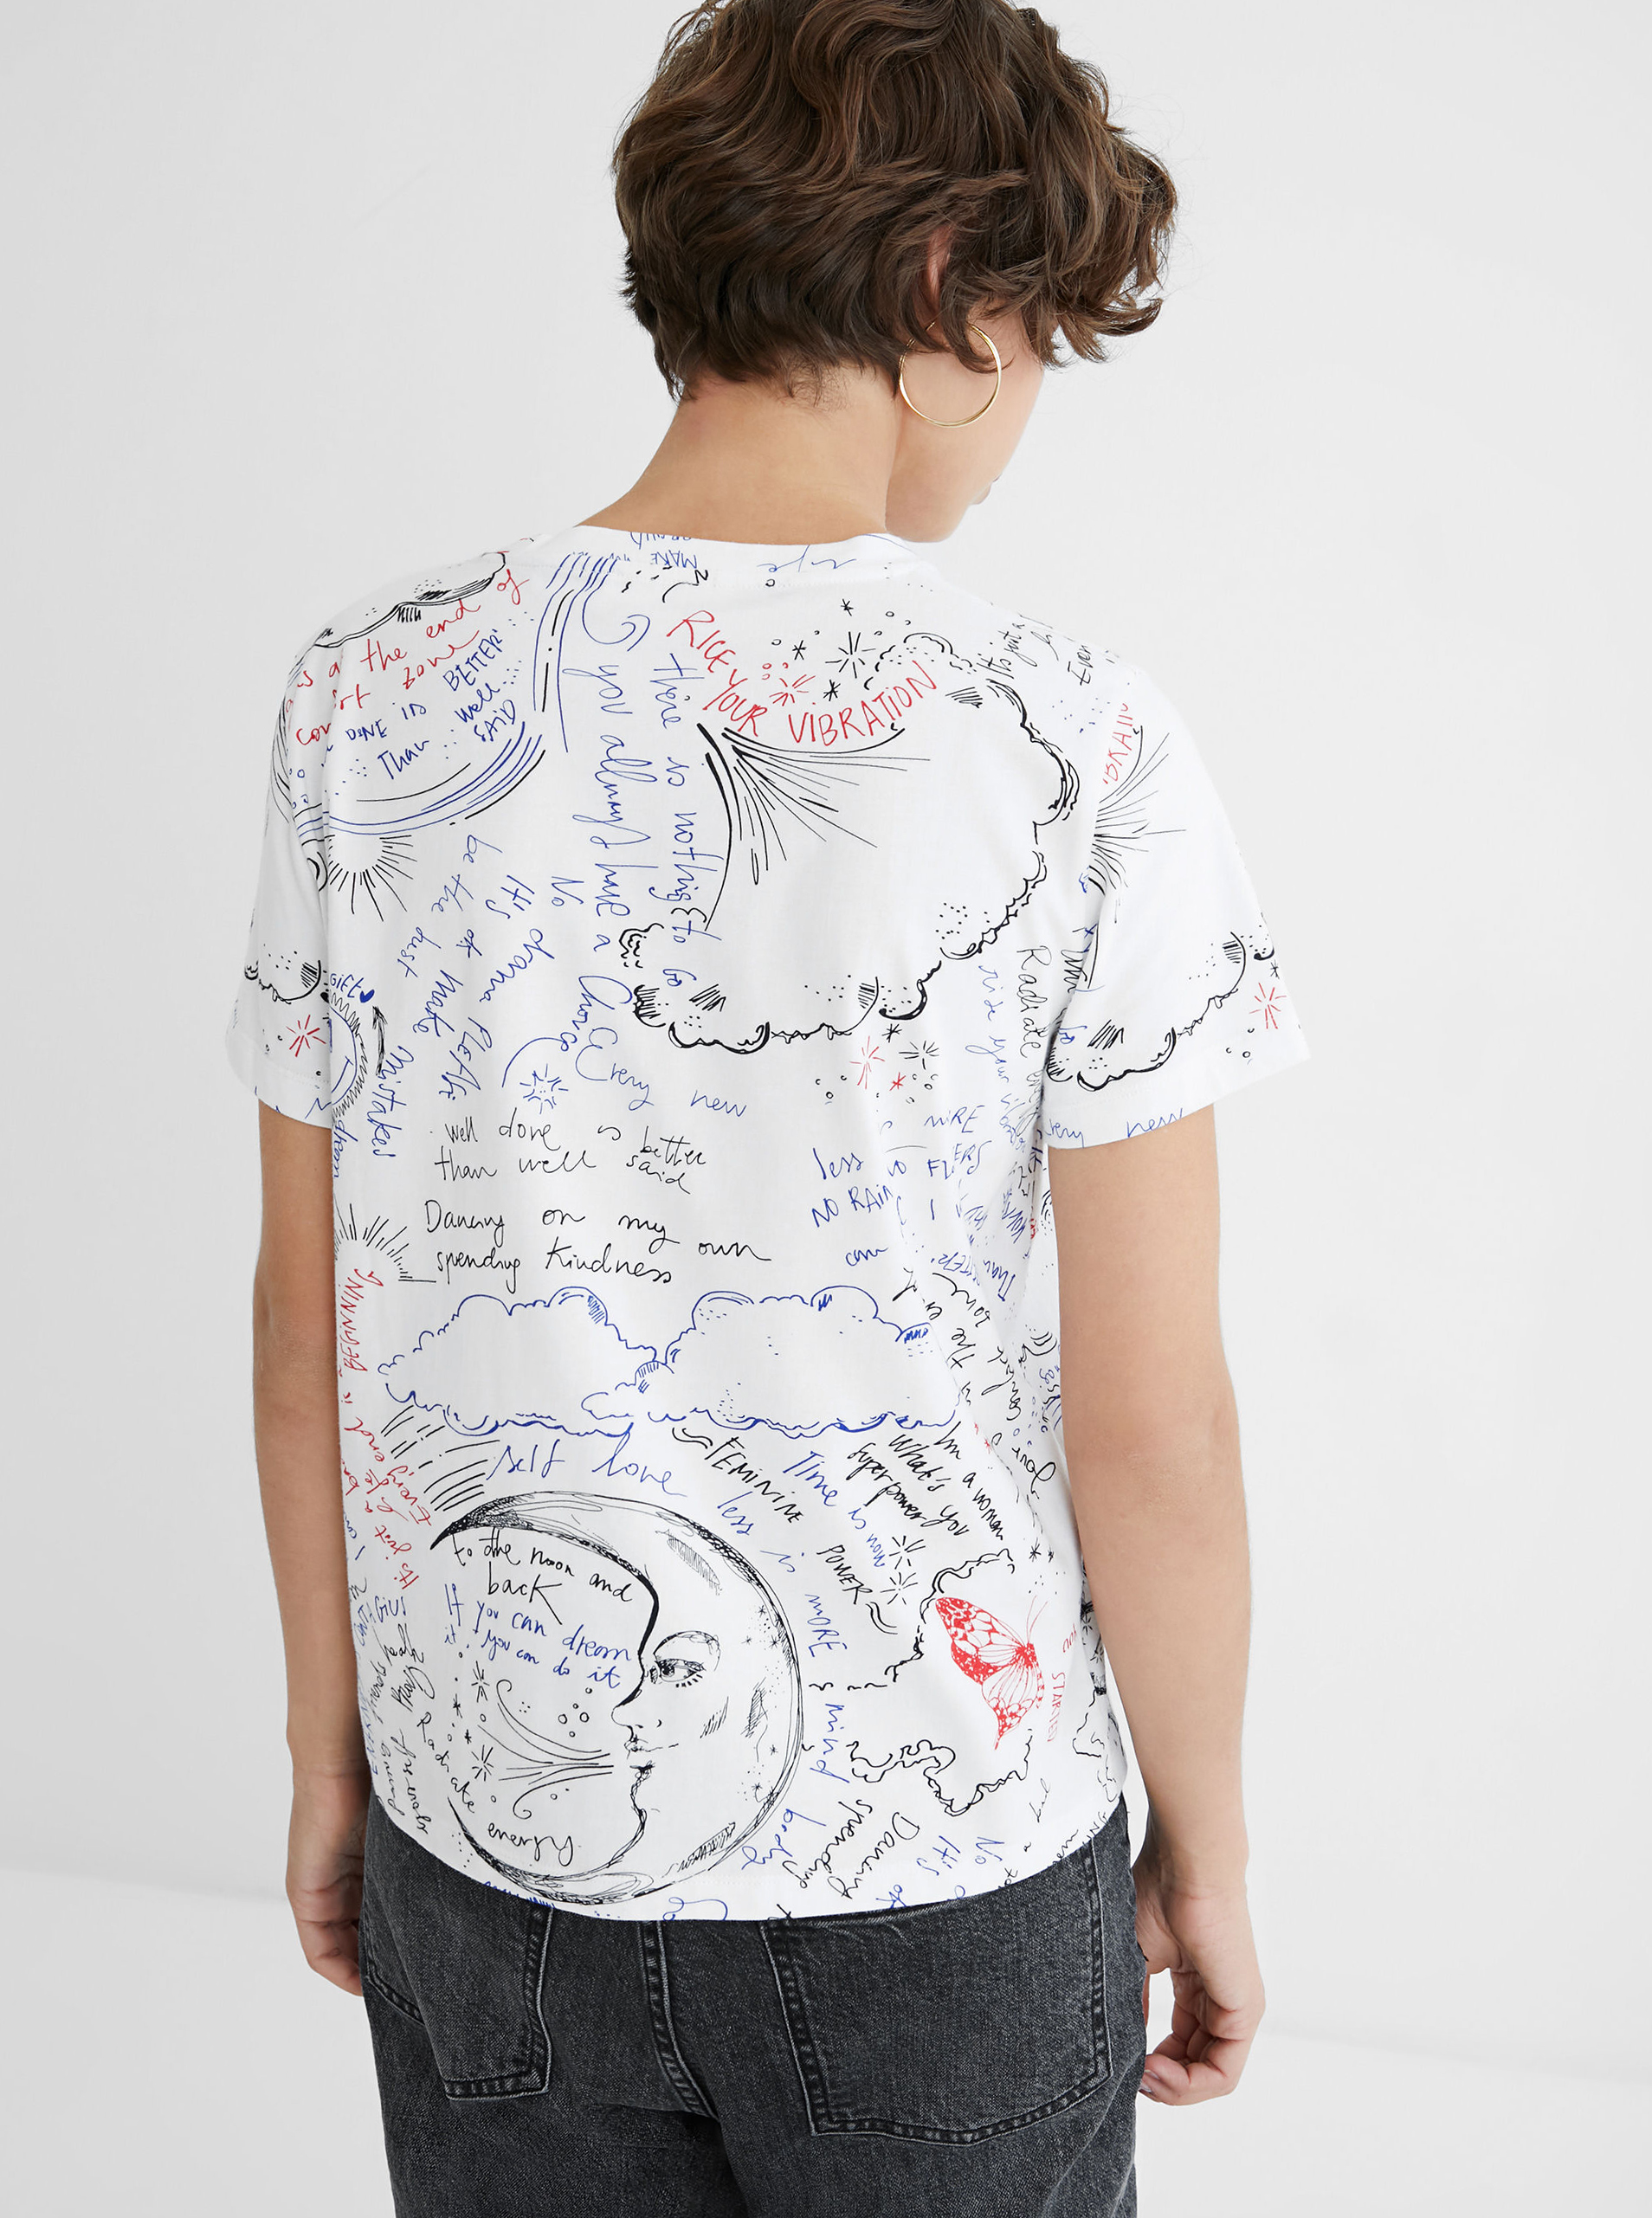 Desigual bijela majica Elizabeth Fry